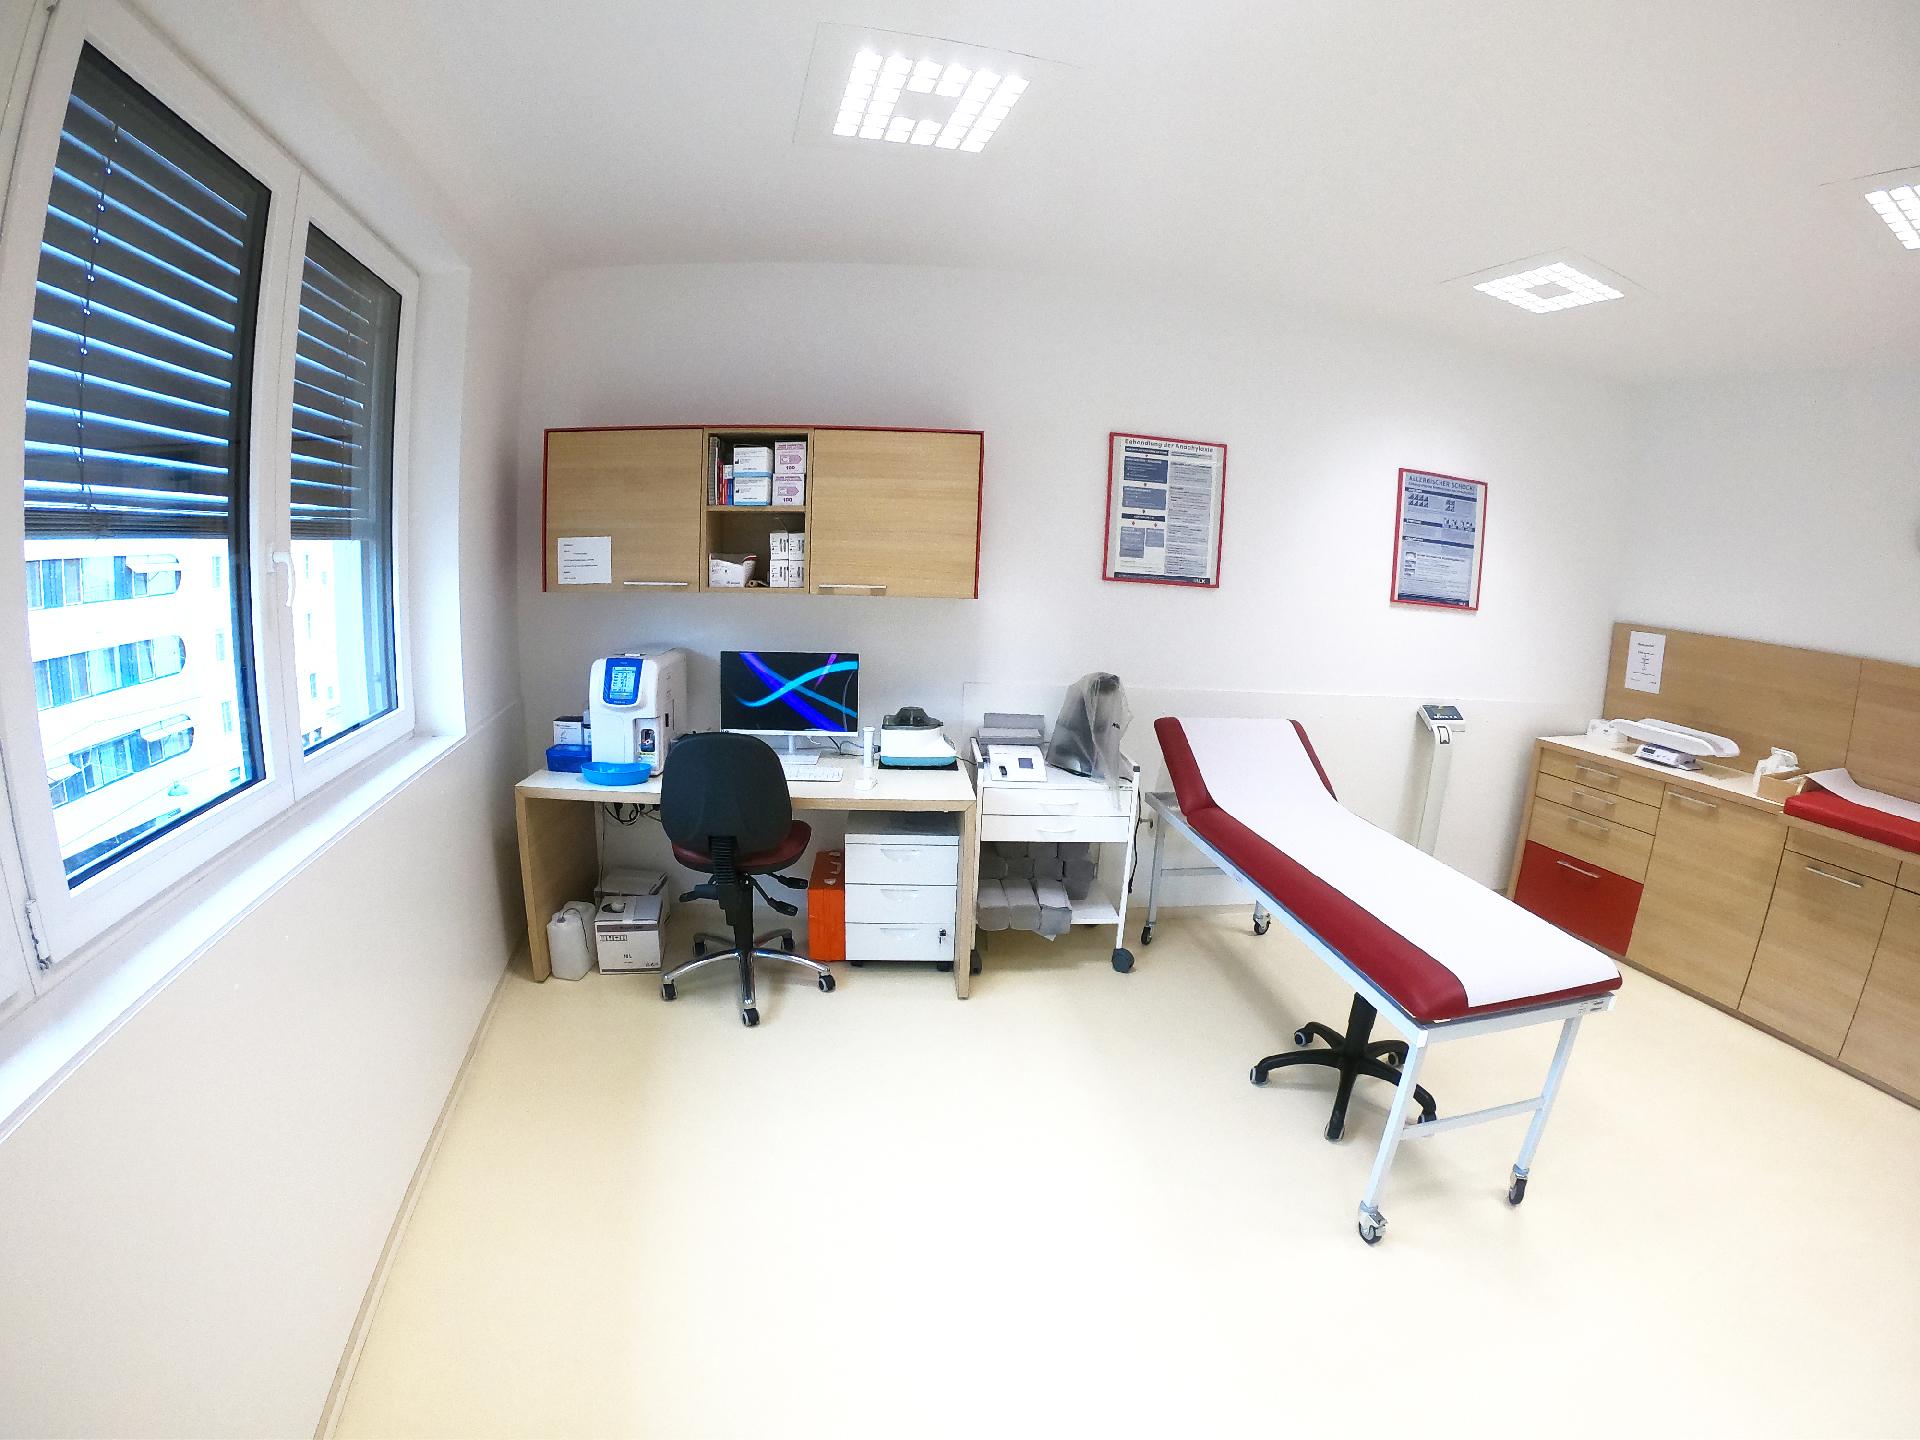 Kinderarzt-wien-19-Dr-Robert-Holzer-KindUndArzt-Praxisimpressionen